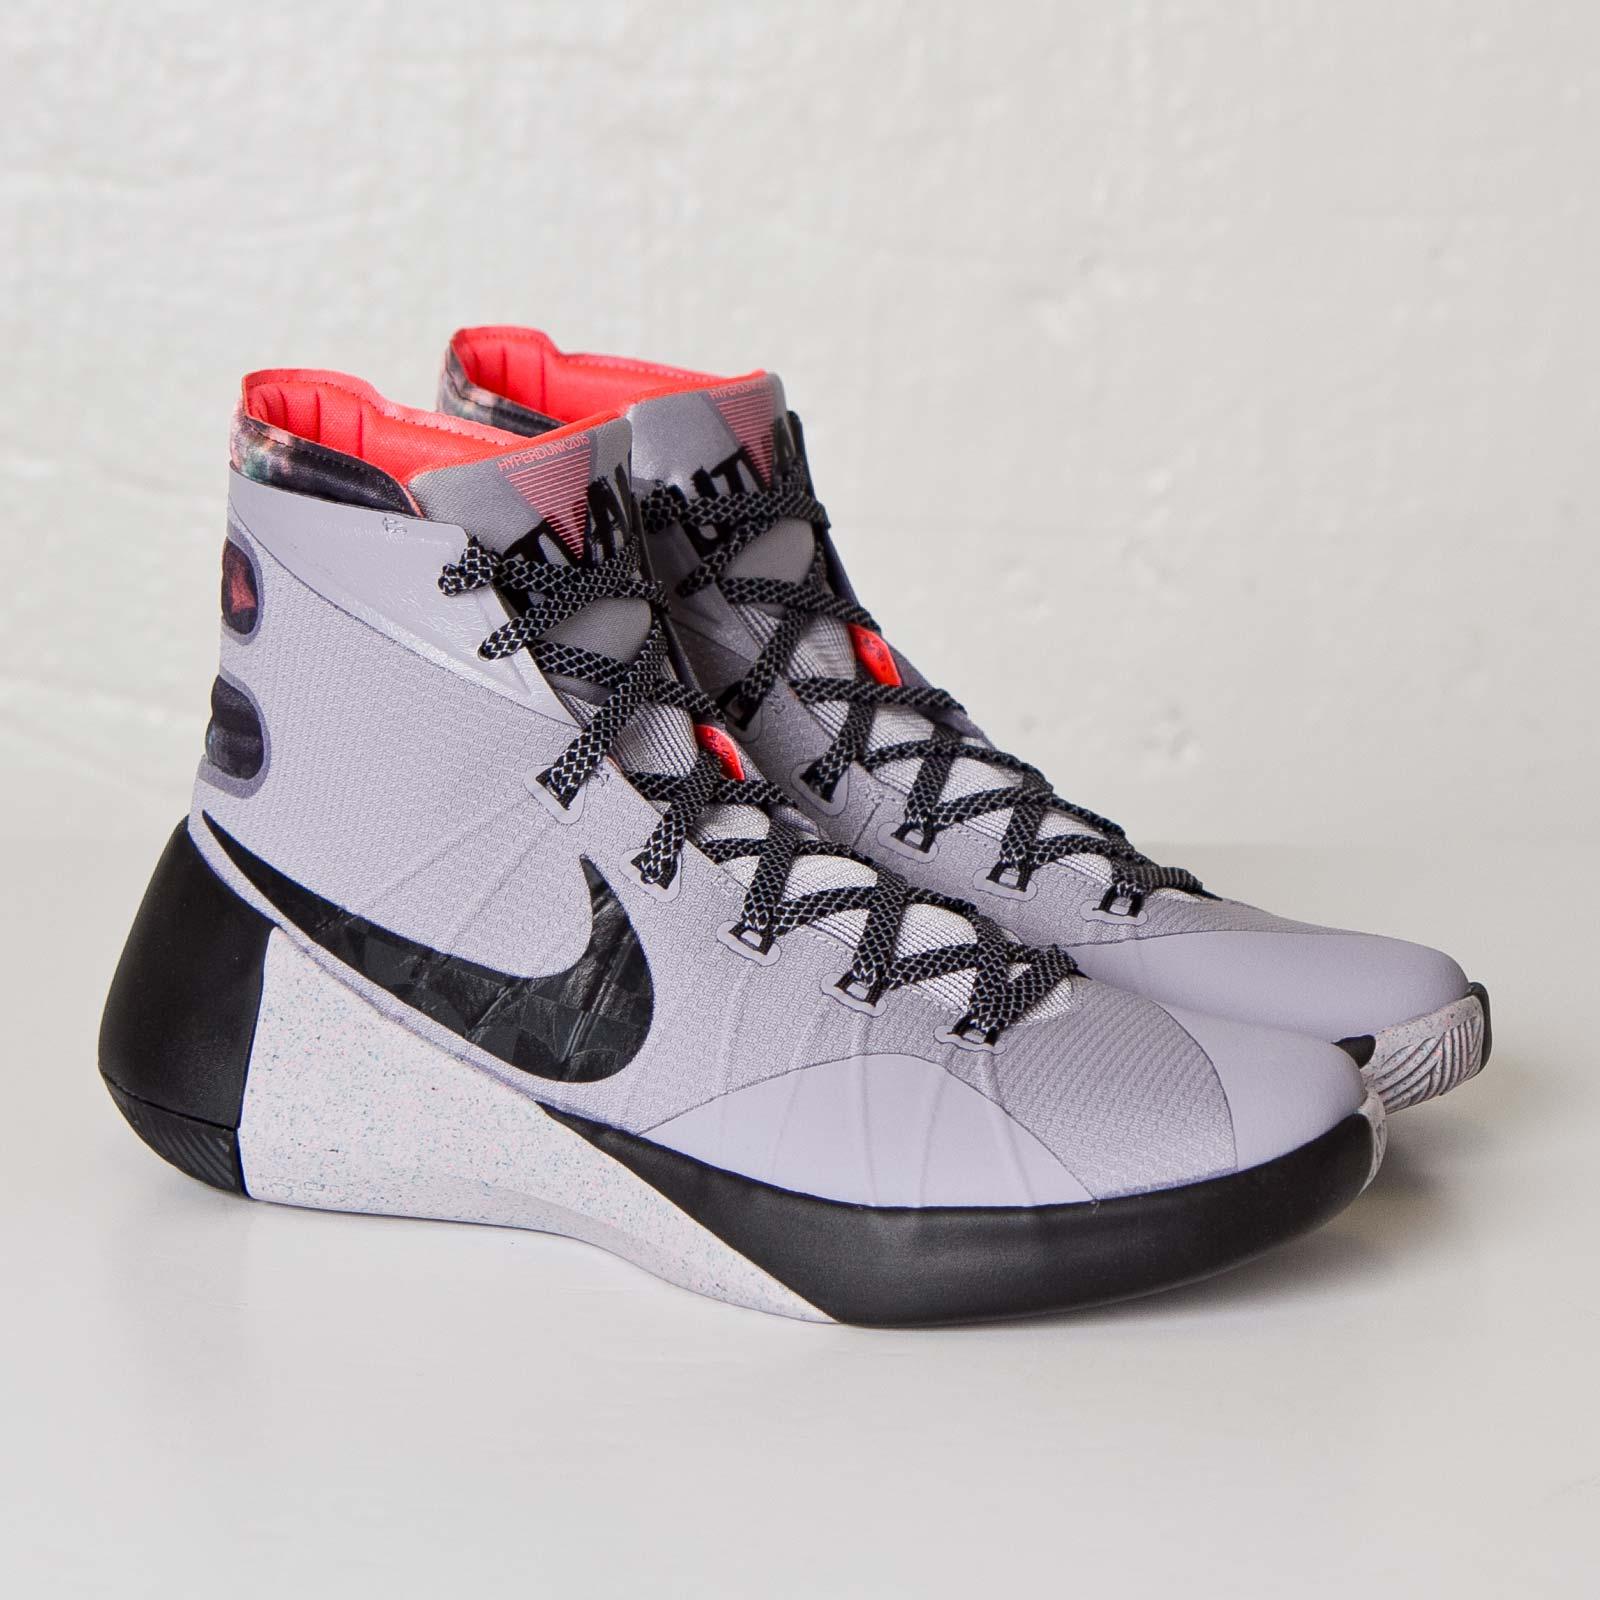 finest selection 1d514 c0bf3 Nike Hyperdunk 2015